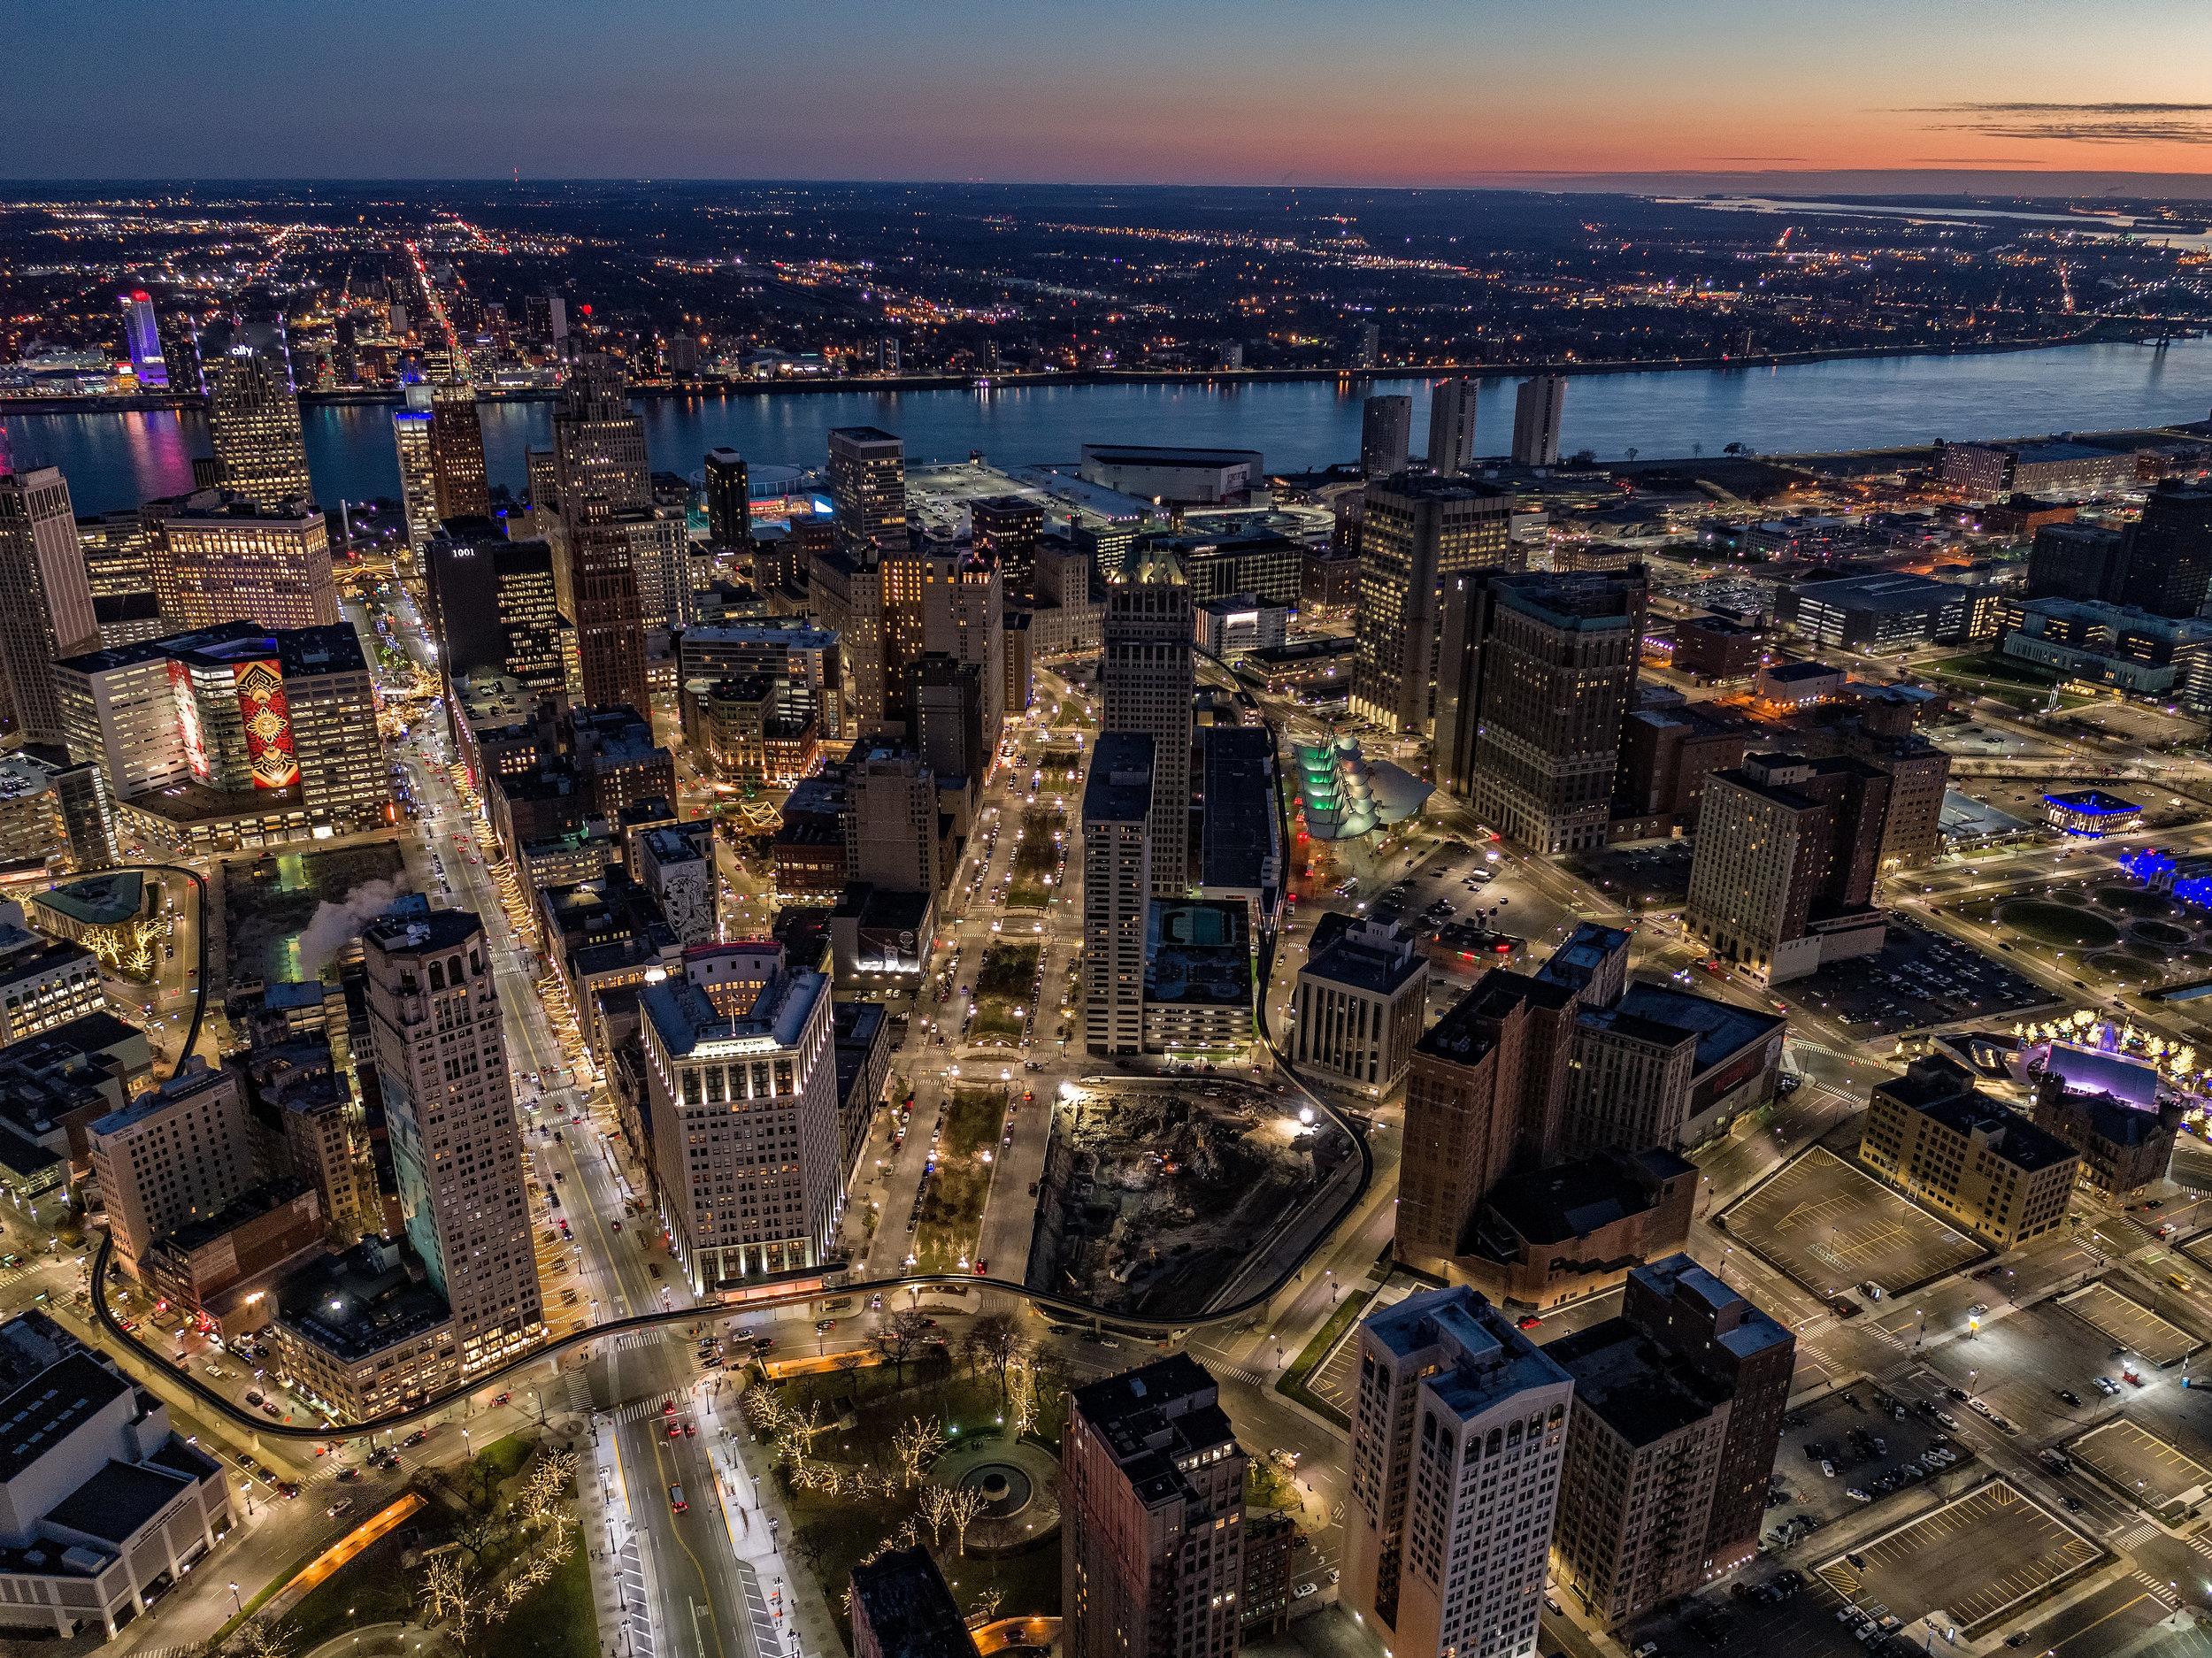 Downtown Detroit Aerial Photograph